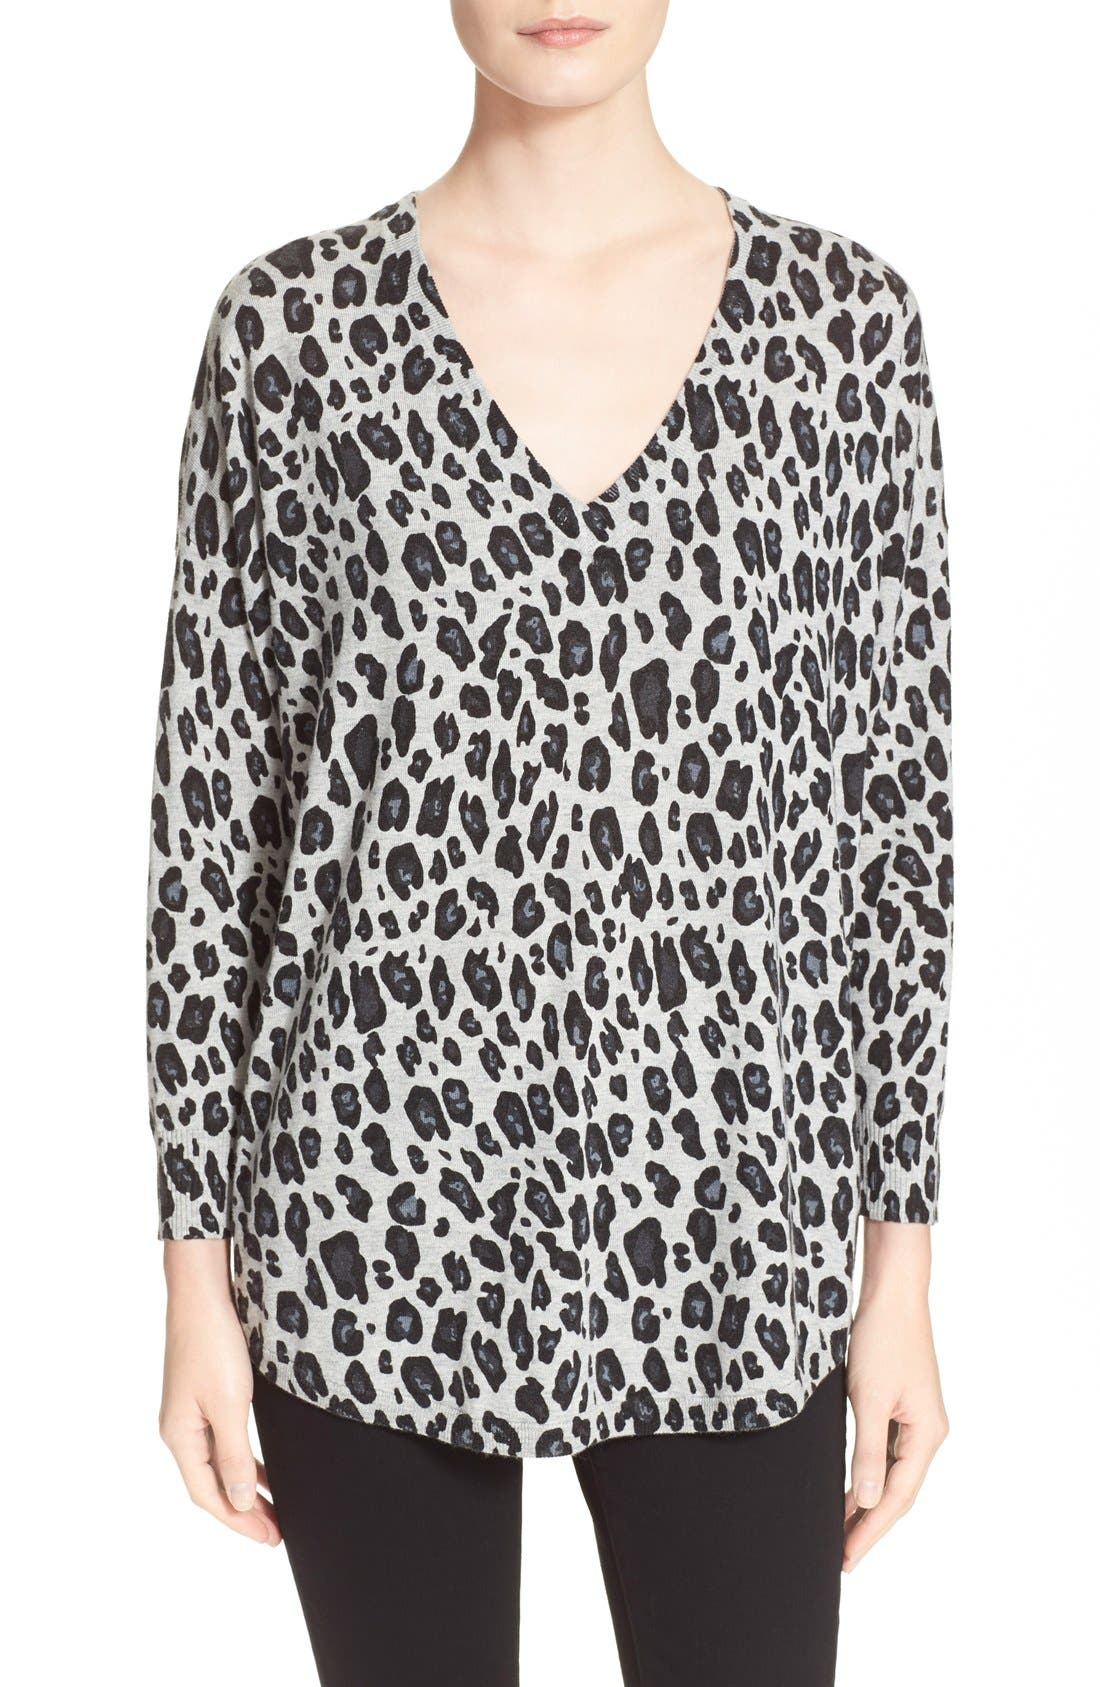 Alternate Image 1 Selected - Joie'Chyanne' Leopard Print V-Neck Pullover